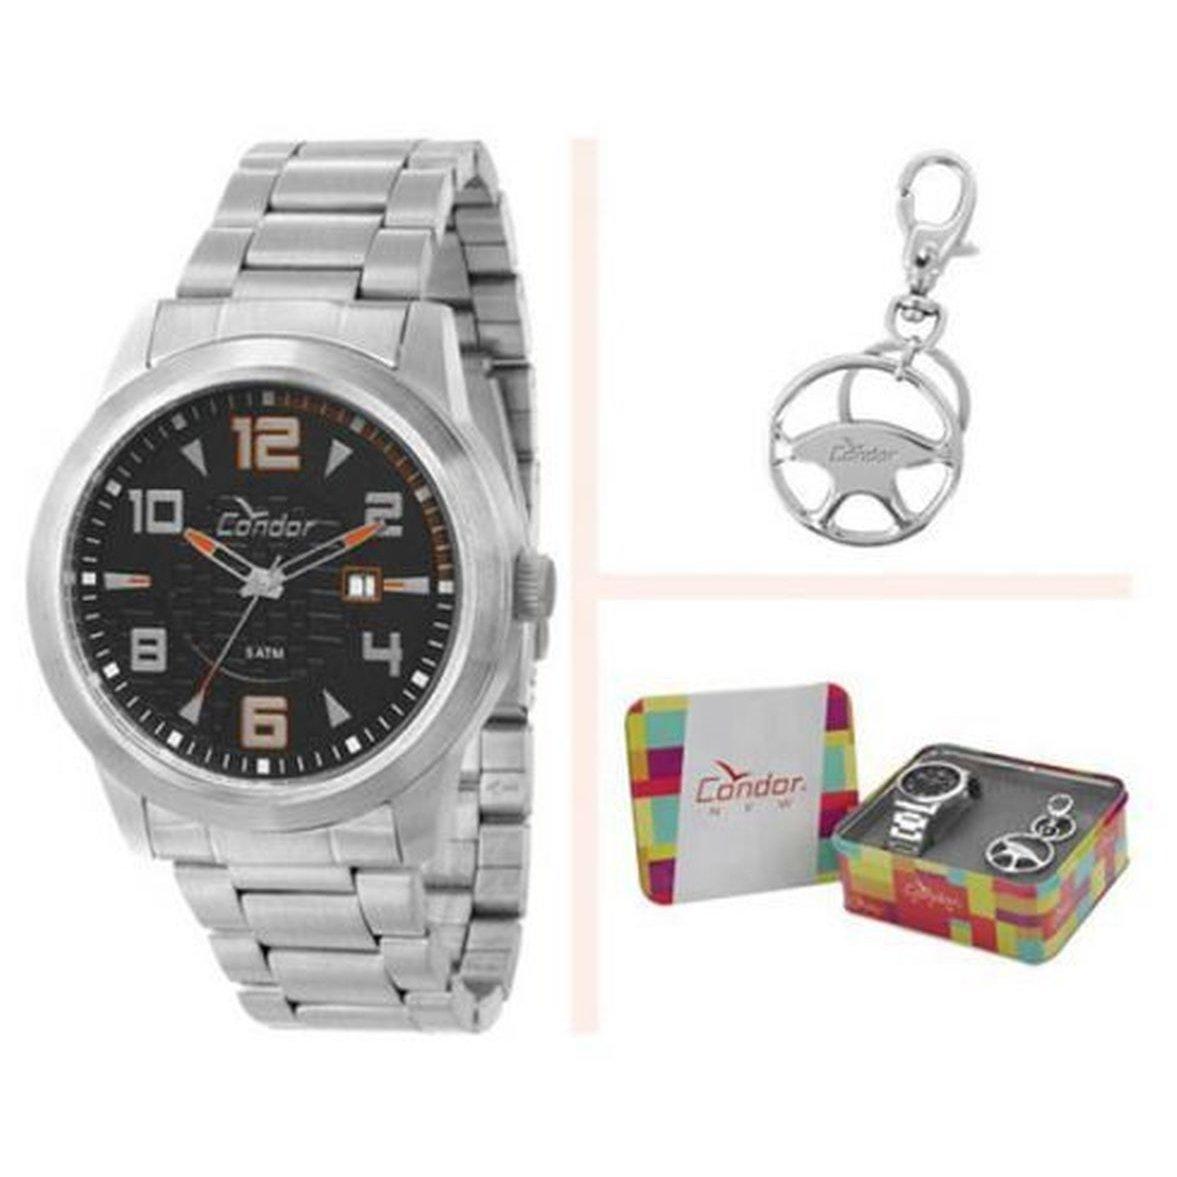 a5cf122f02ac4 Relógio Feminino Allora Analogico Fashion - Compre Agora   Netshoes